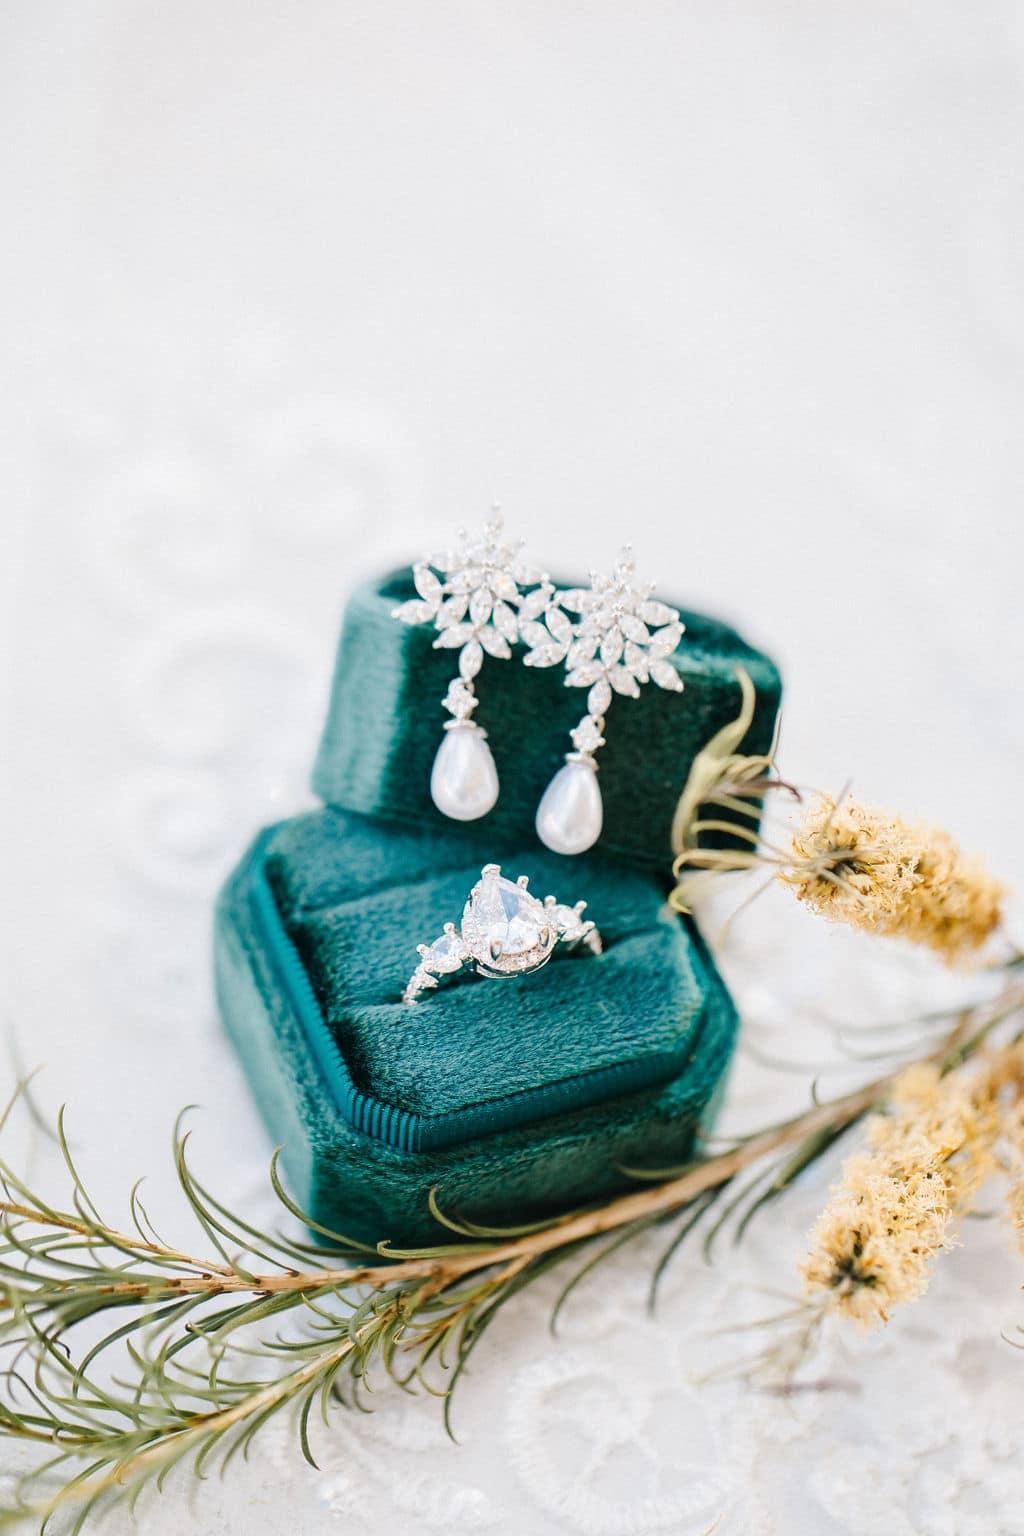 micro wedding Disney Princess and the Frog Wedding Theme jewelry